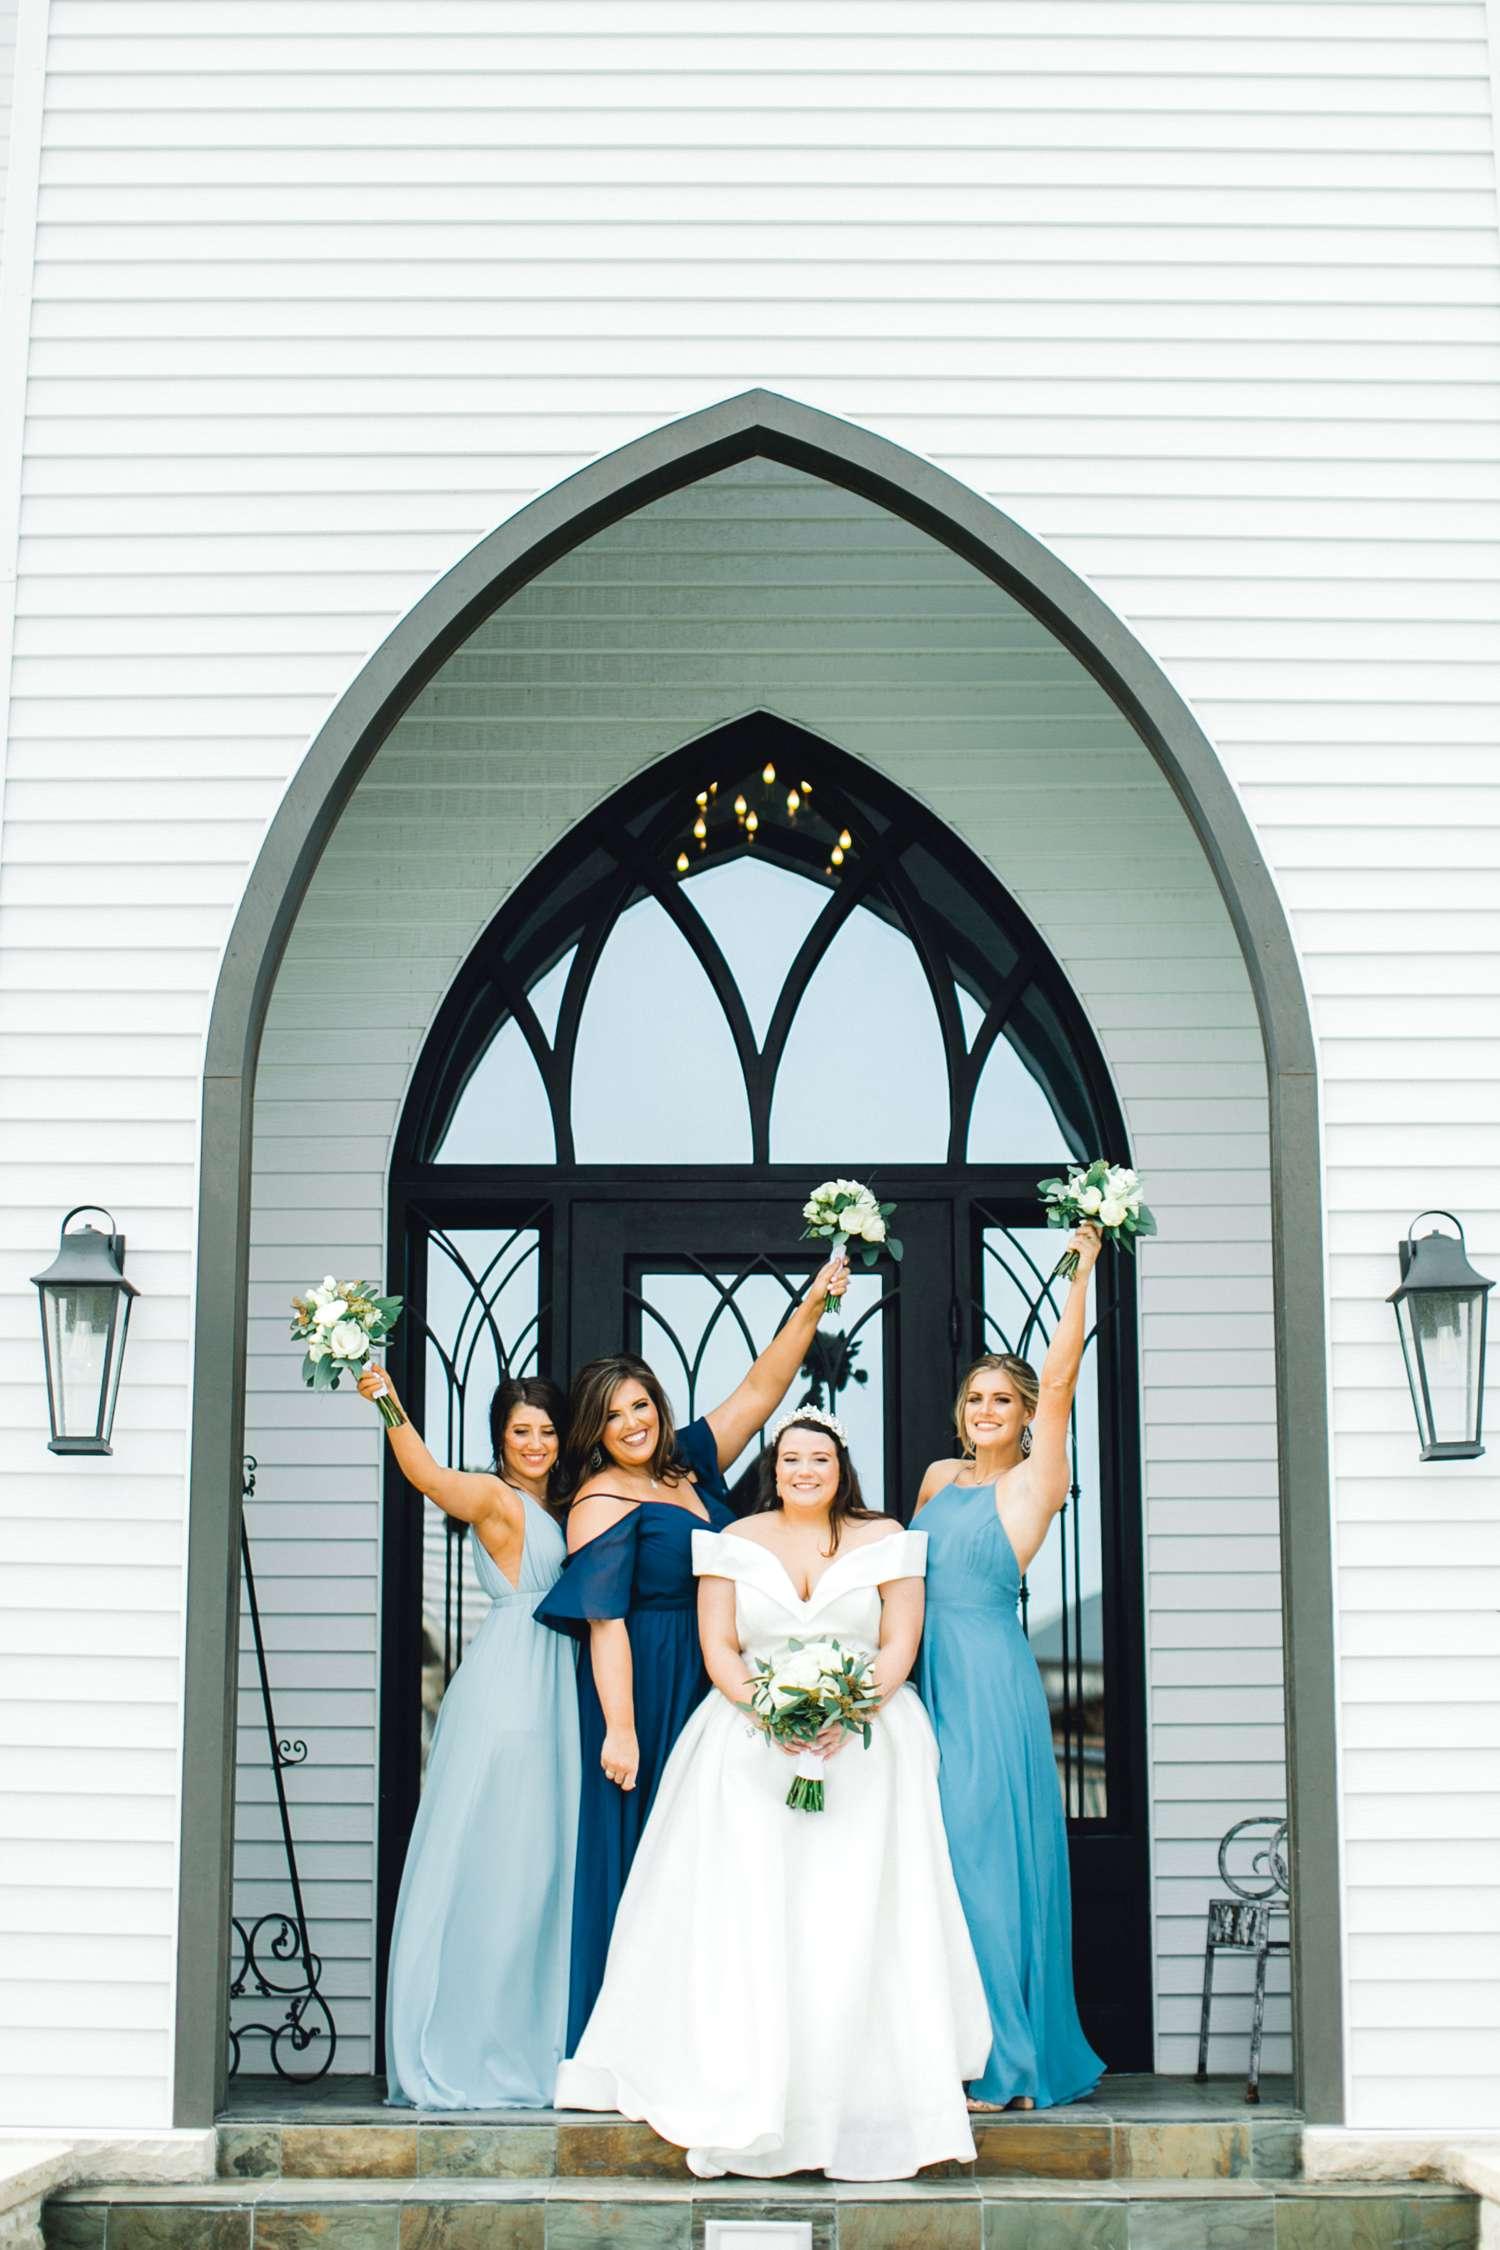 CASSIDY+AND+HARLEY+BRADLEY+EBERLEY+BROOKS+CHAPEL+LUBBOCK+WEDDING+PHOTOGRAPHER+ALLEEJ_0040.jpg